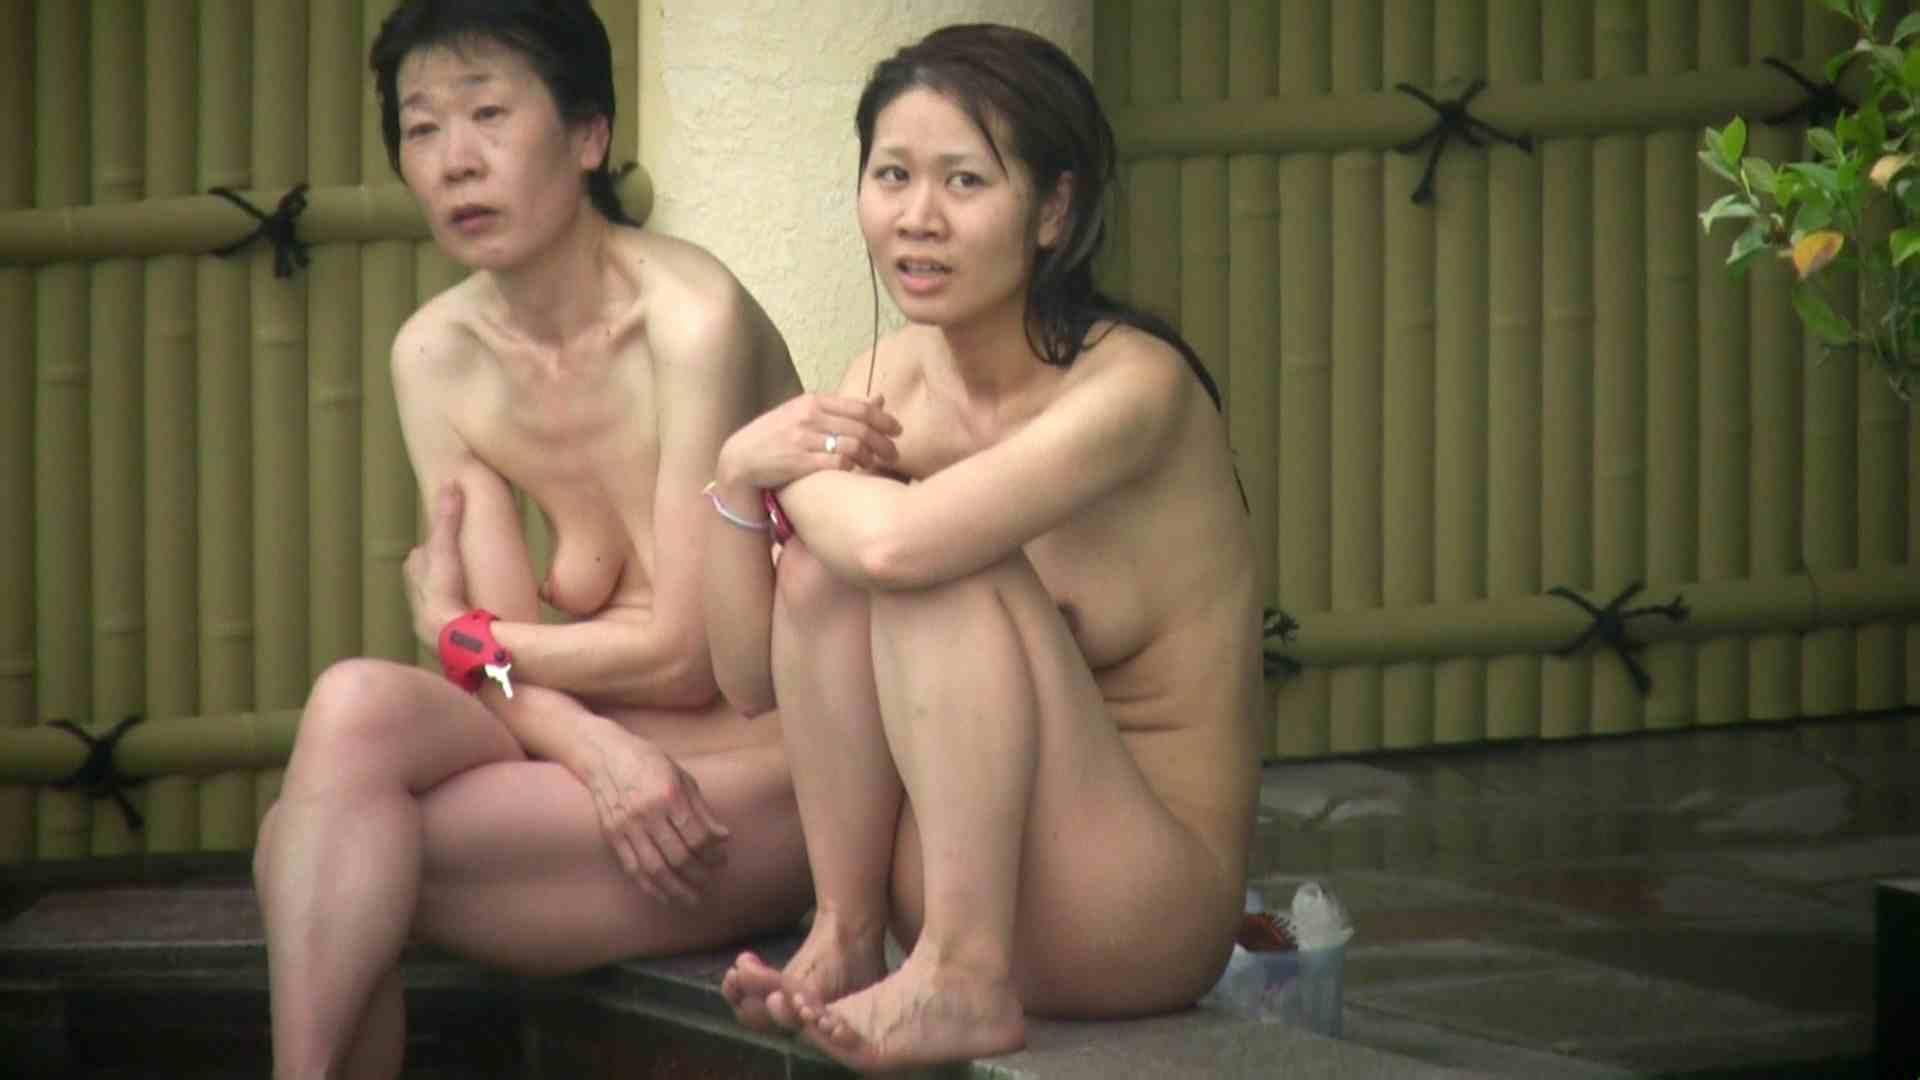 Aquaな露天風呂Vol.07 盗撮シリーズ   露天風呂編  94PIX 77